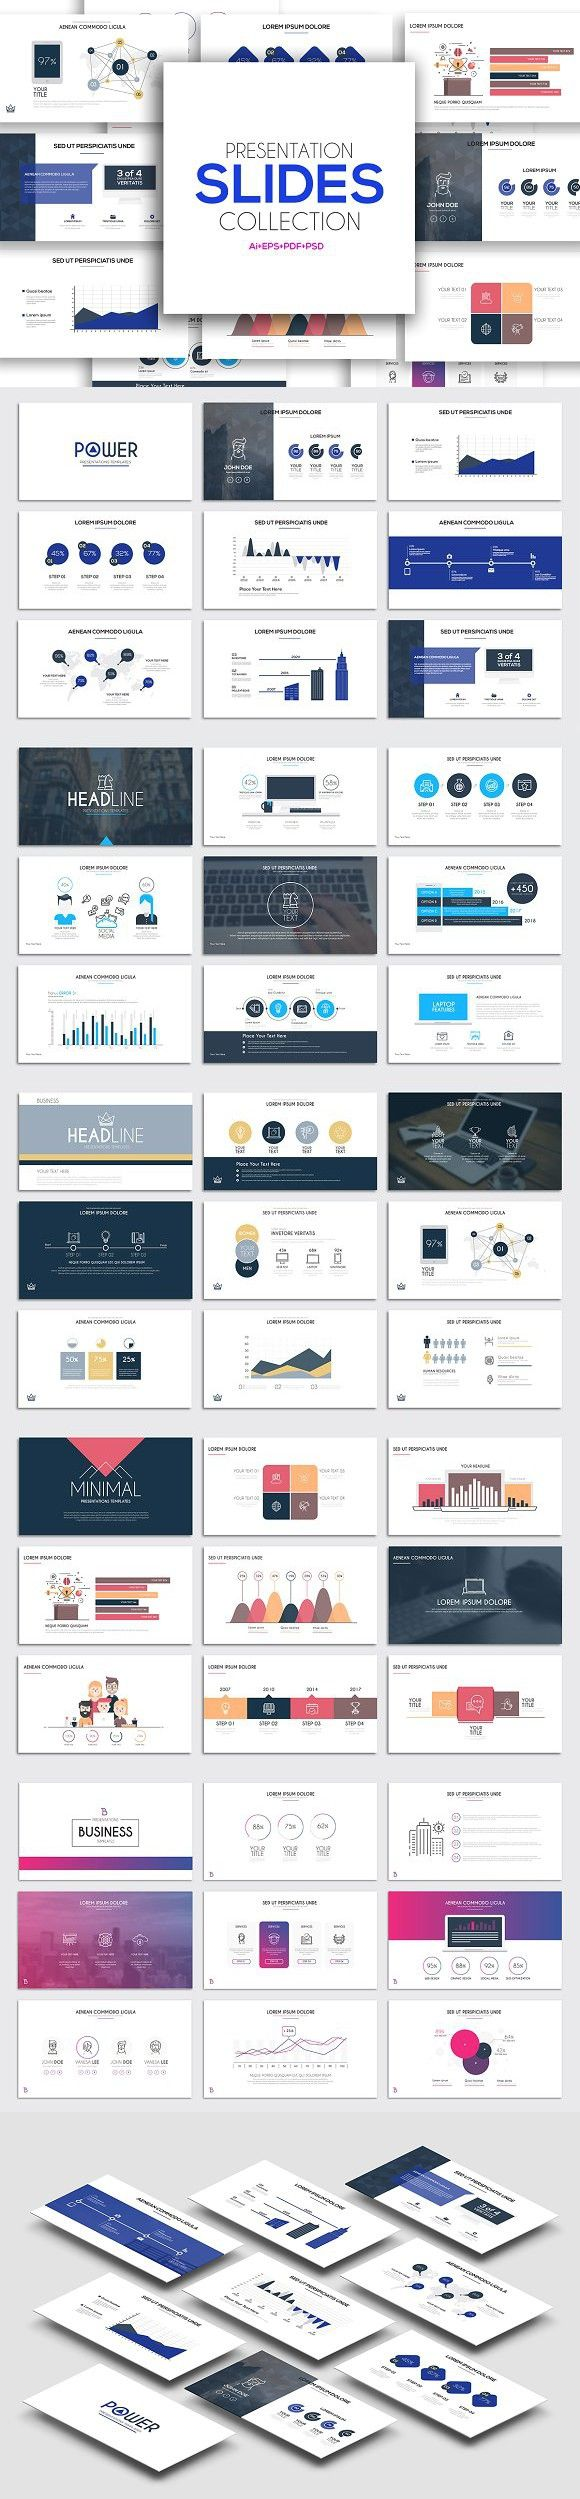 Presentation slide templates. Infographic Templates. $19.00